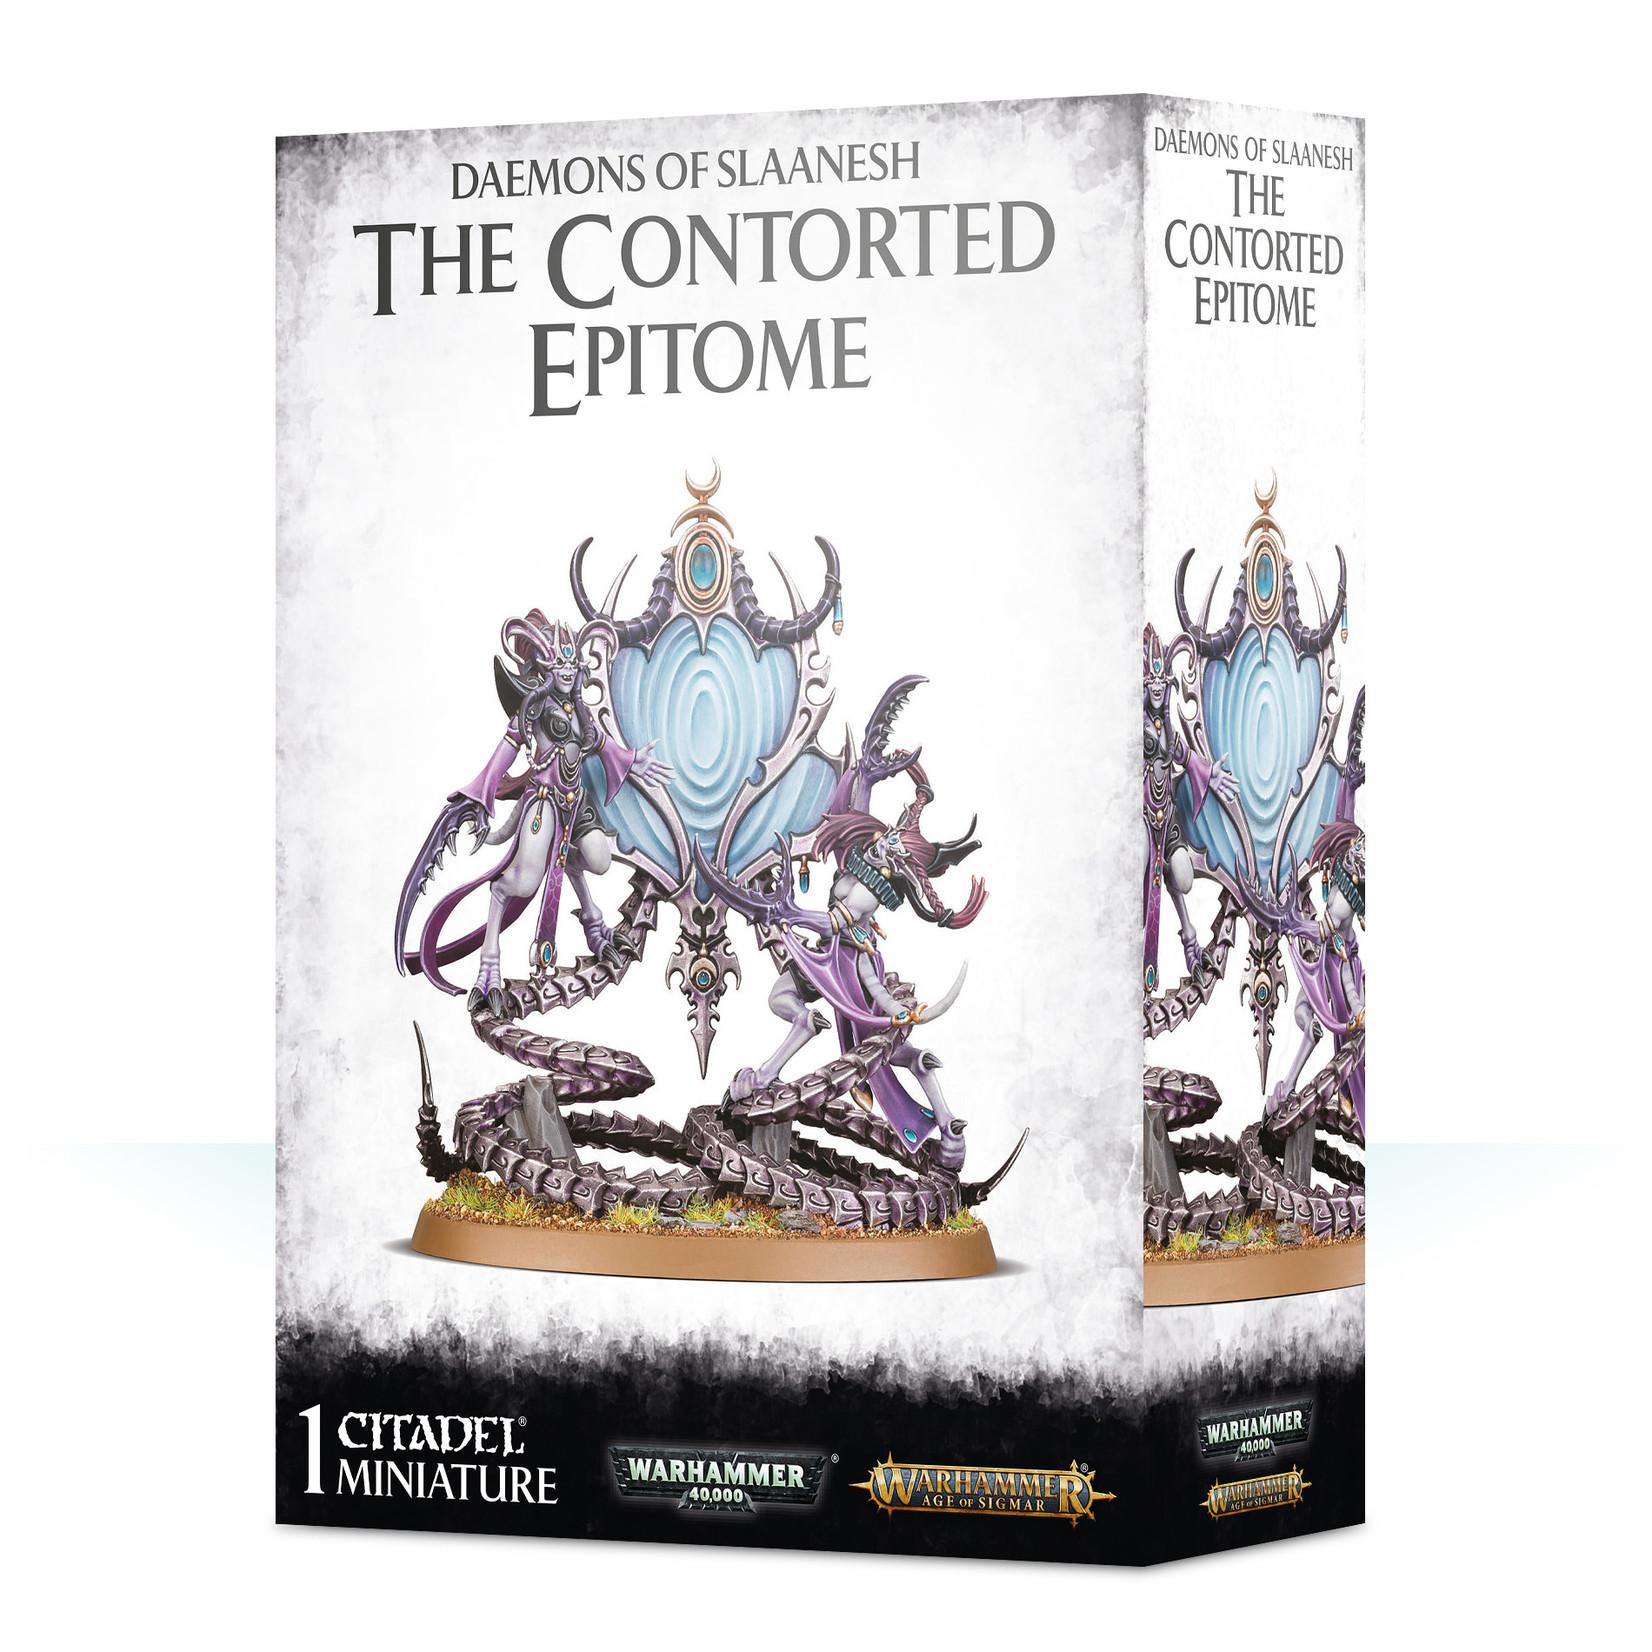 Games Workshop Daemons/slaanesh: The Contorted Epitome